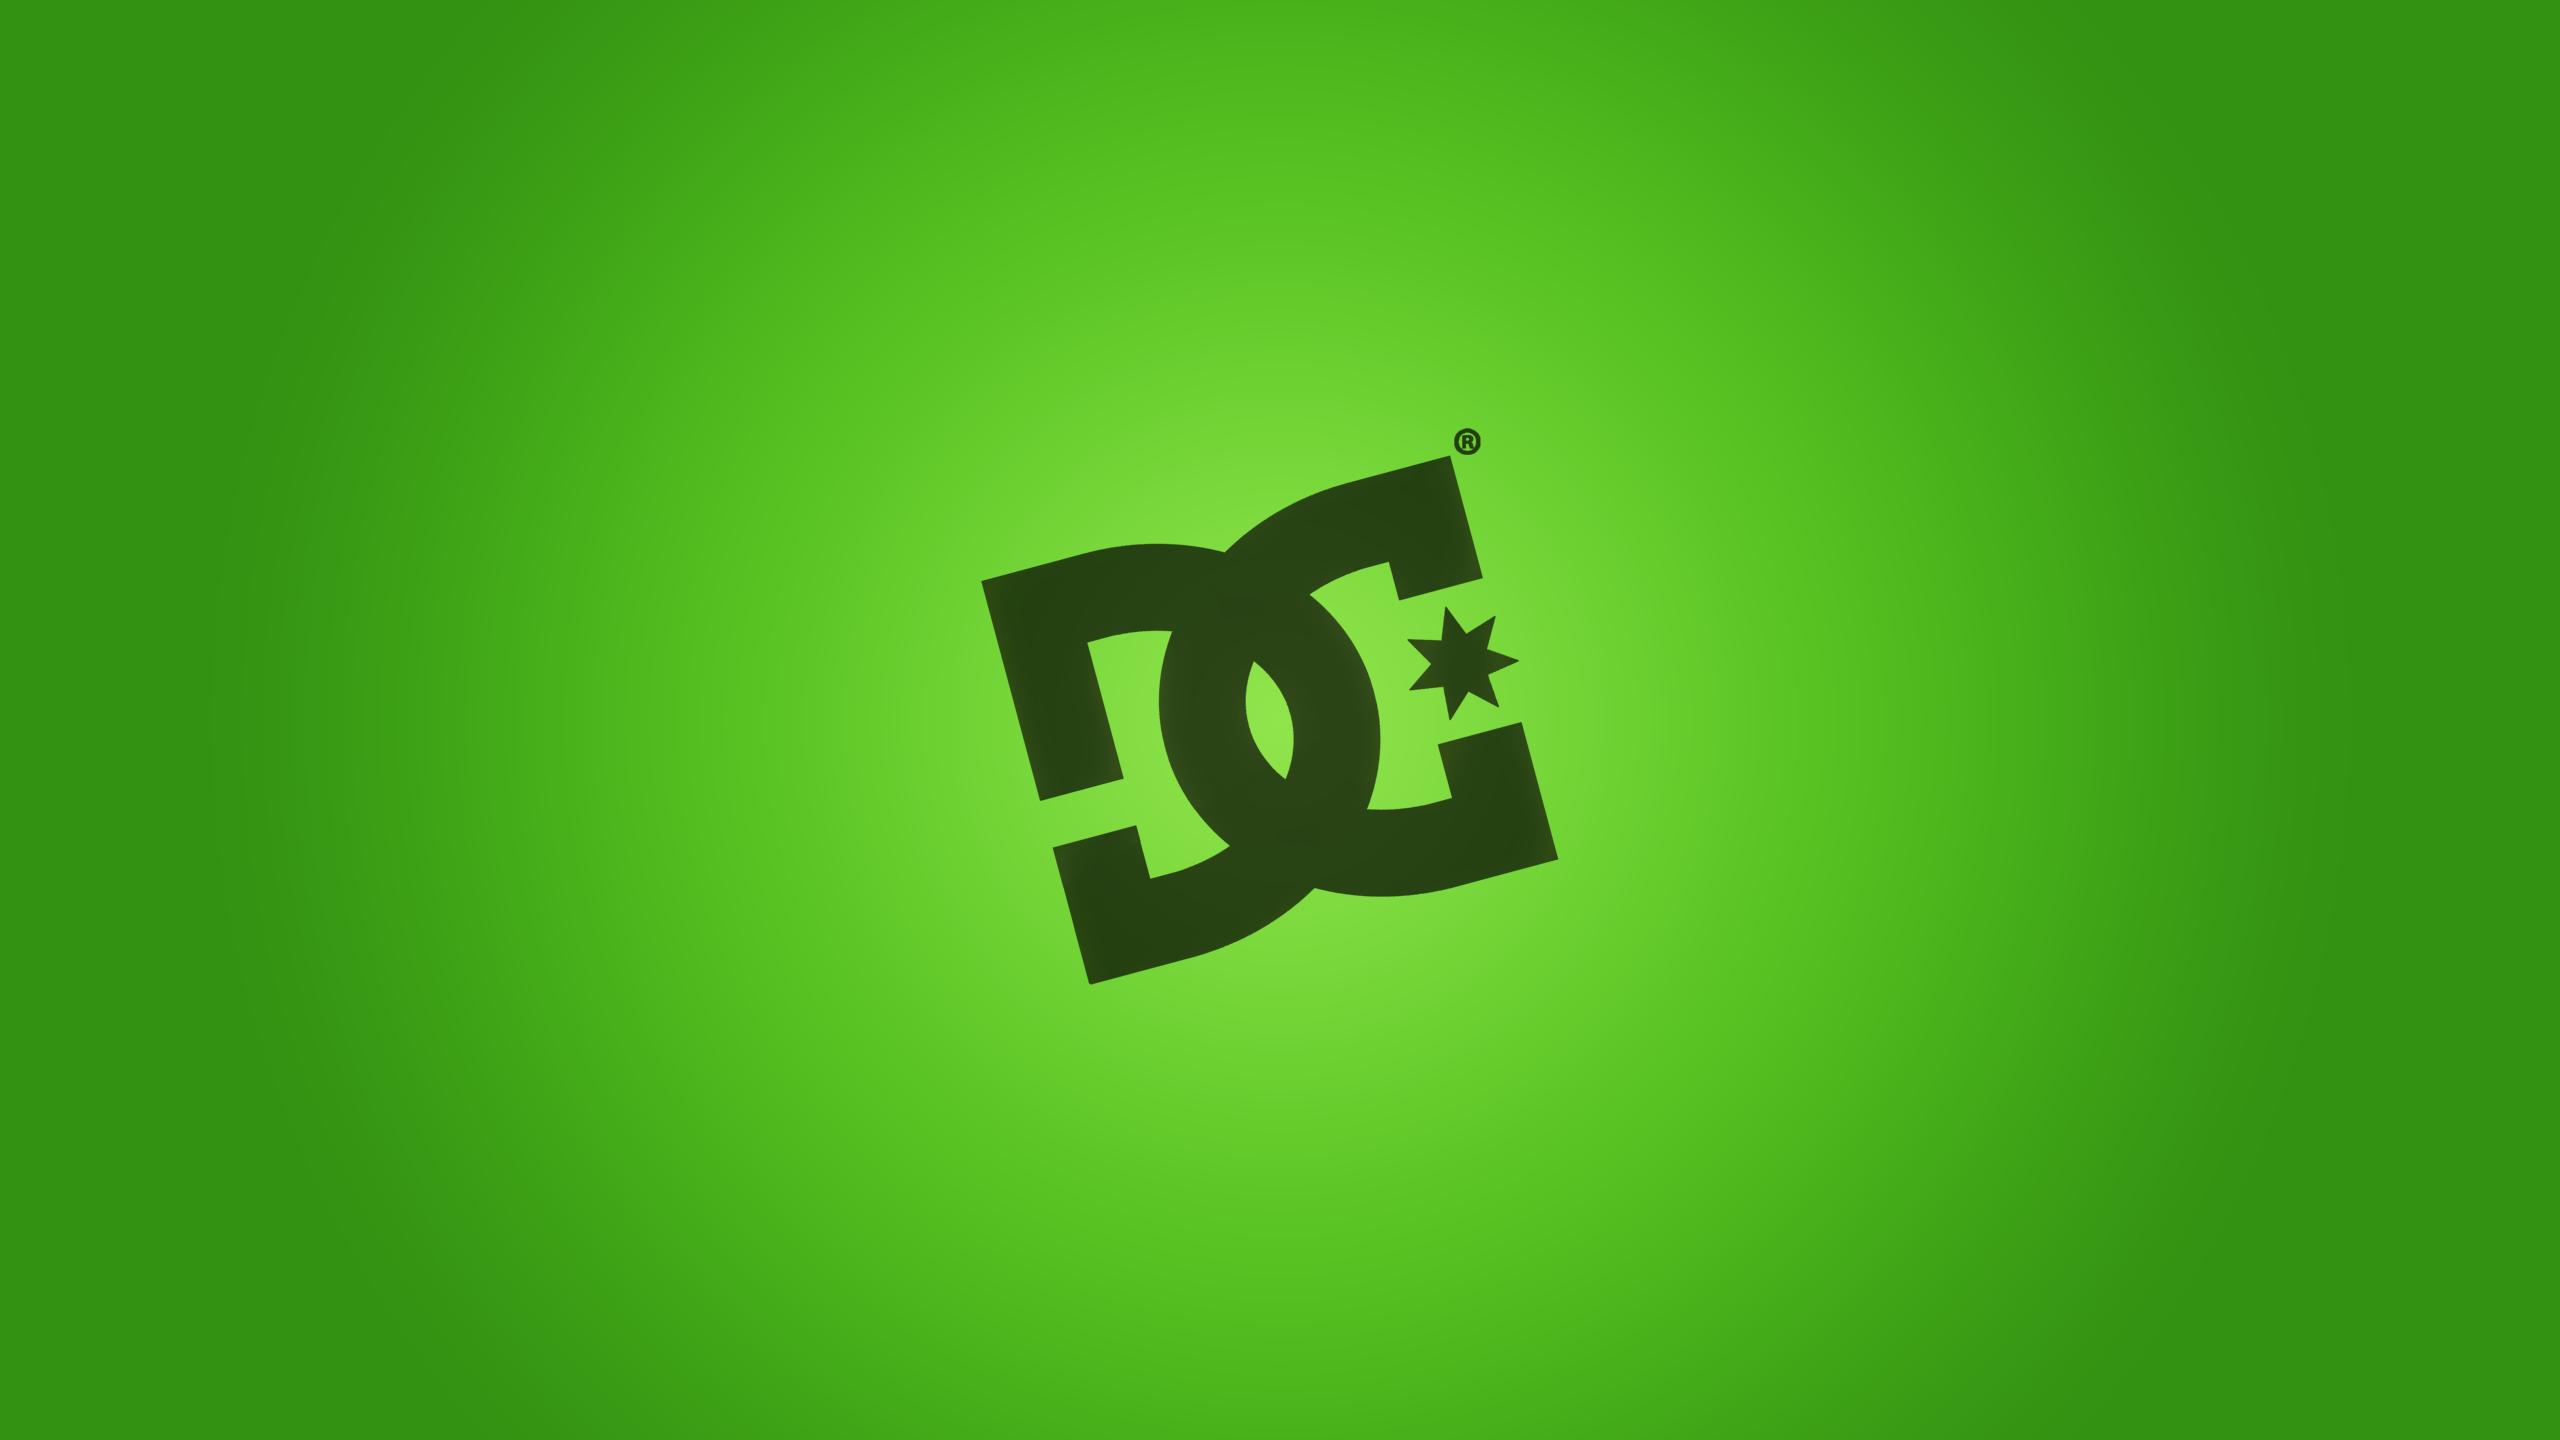 50 Dc Shoes Logo Wallpaper Hd On Wallpapersafari